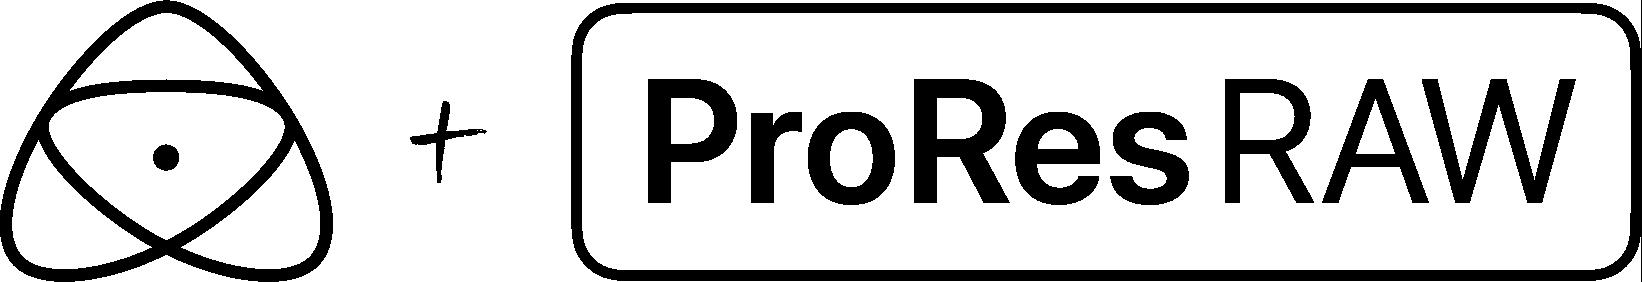 ProRes RAW logo